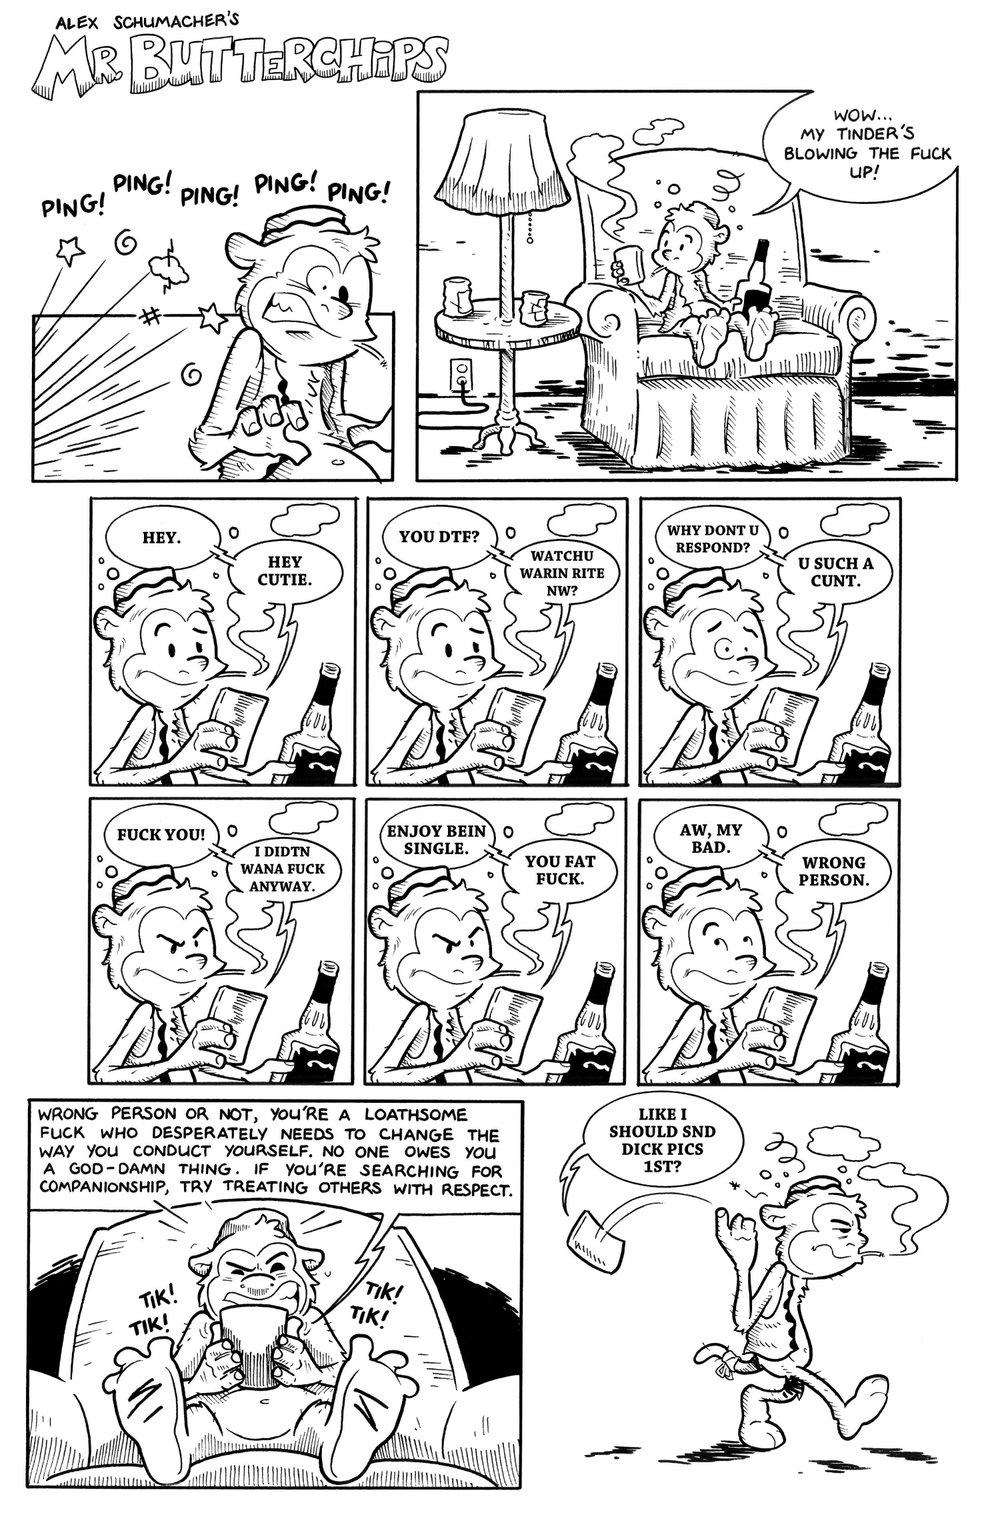 Mr. Butterchips #25.jpg